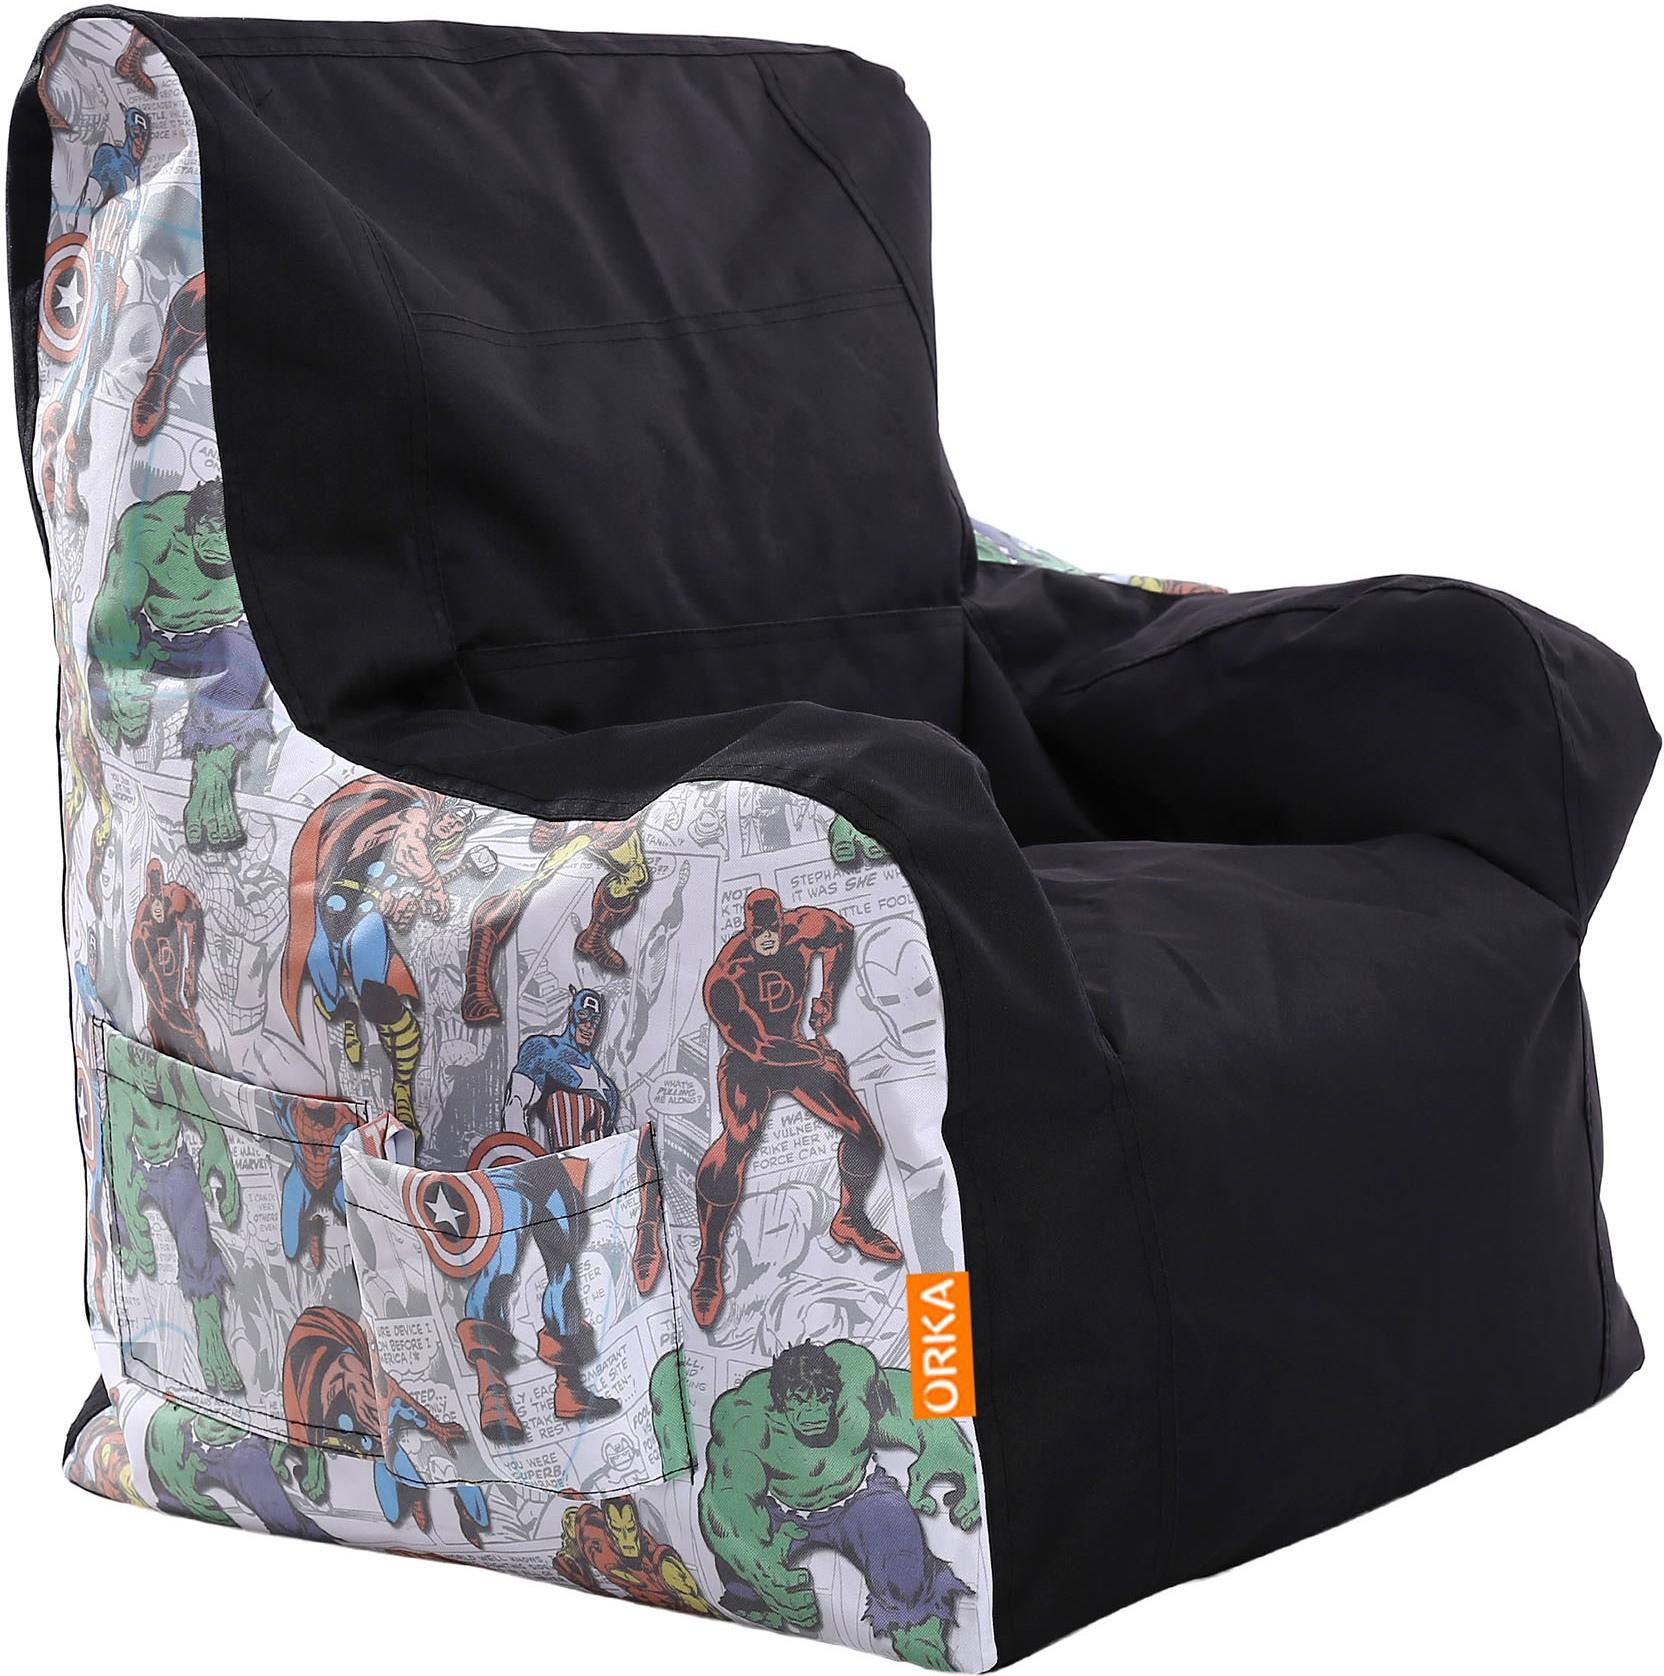 avengers bean bag chair room hammock orka xxxl digital printed arm with furniture price list